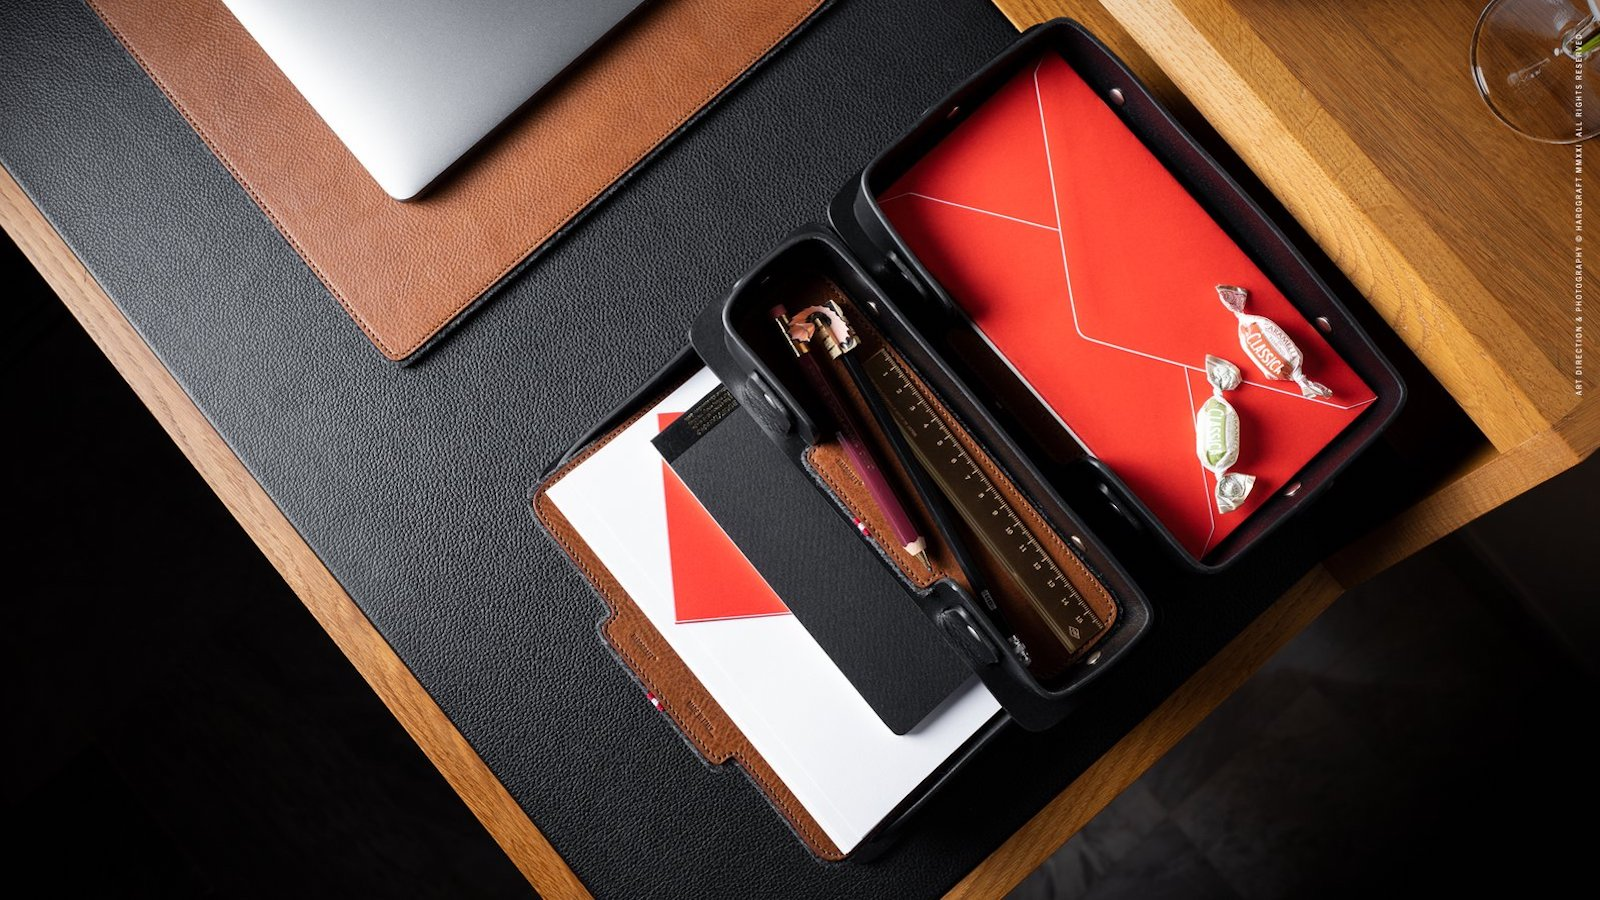 hardgraft Inbox Tray Trio desk organizer boasts 3 leather trays for office essentials